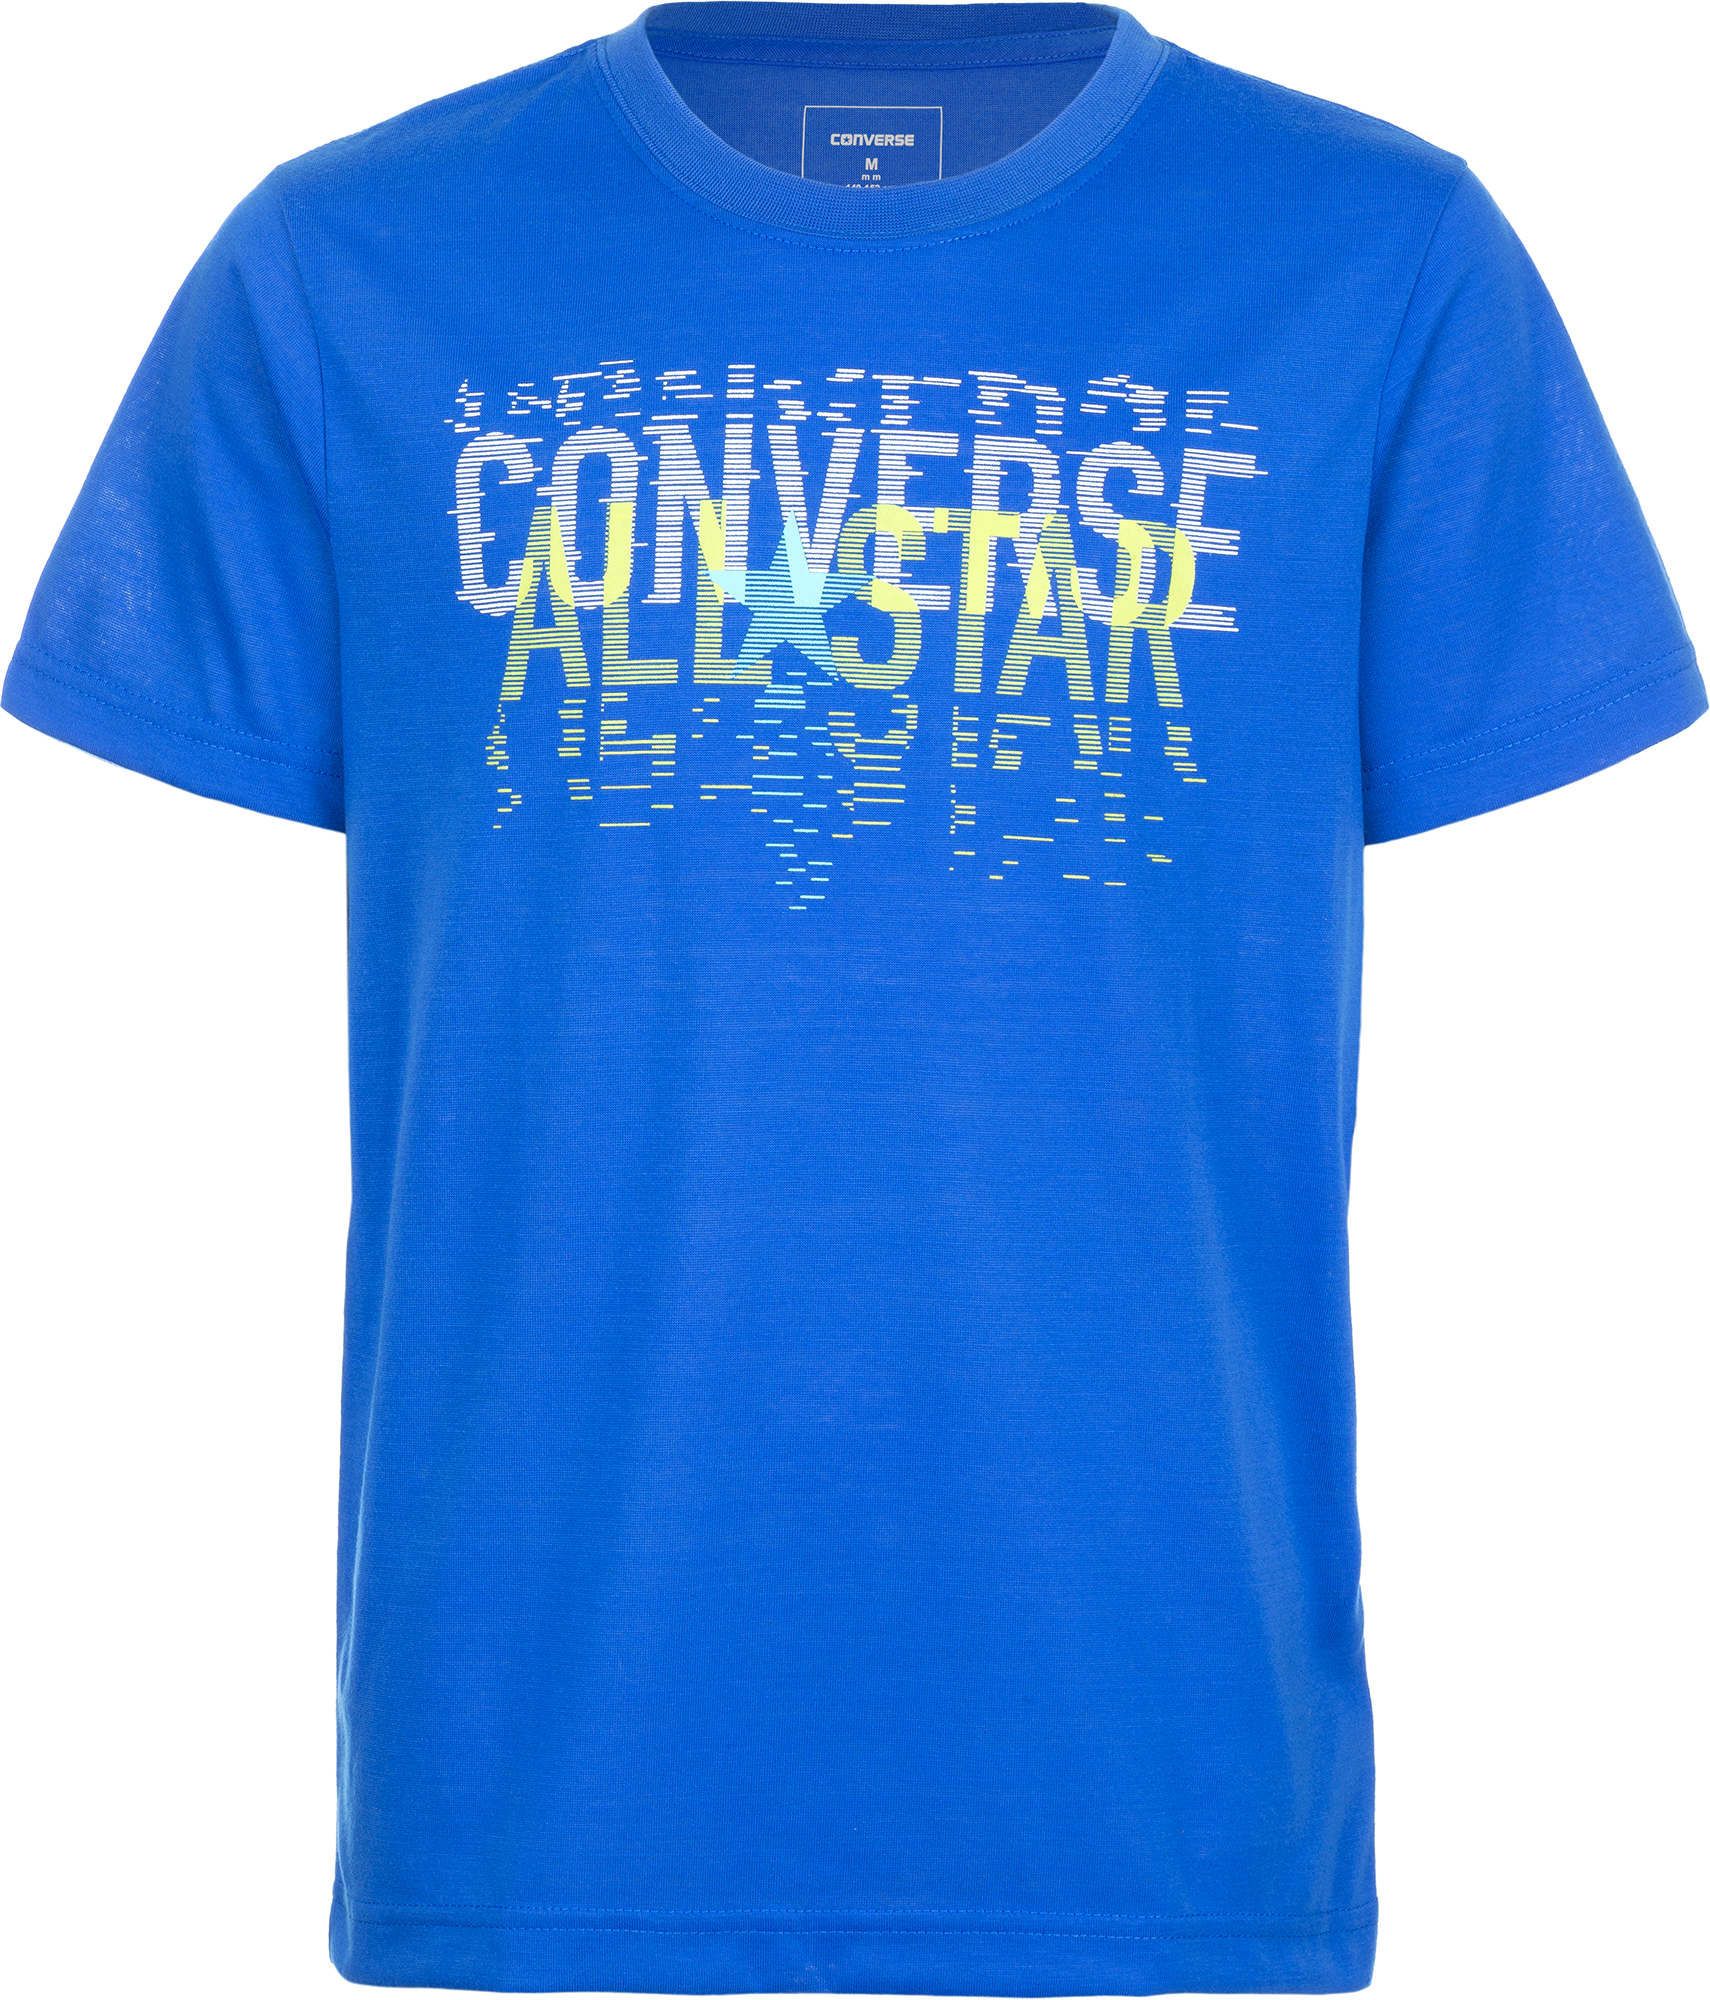 Converse Футболка для мальчиков Converse